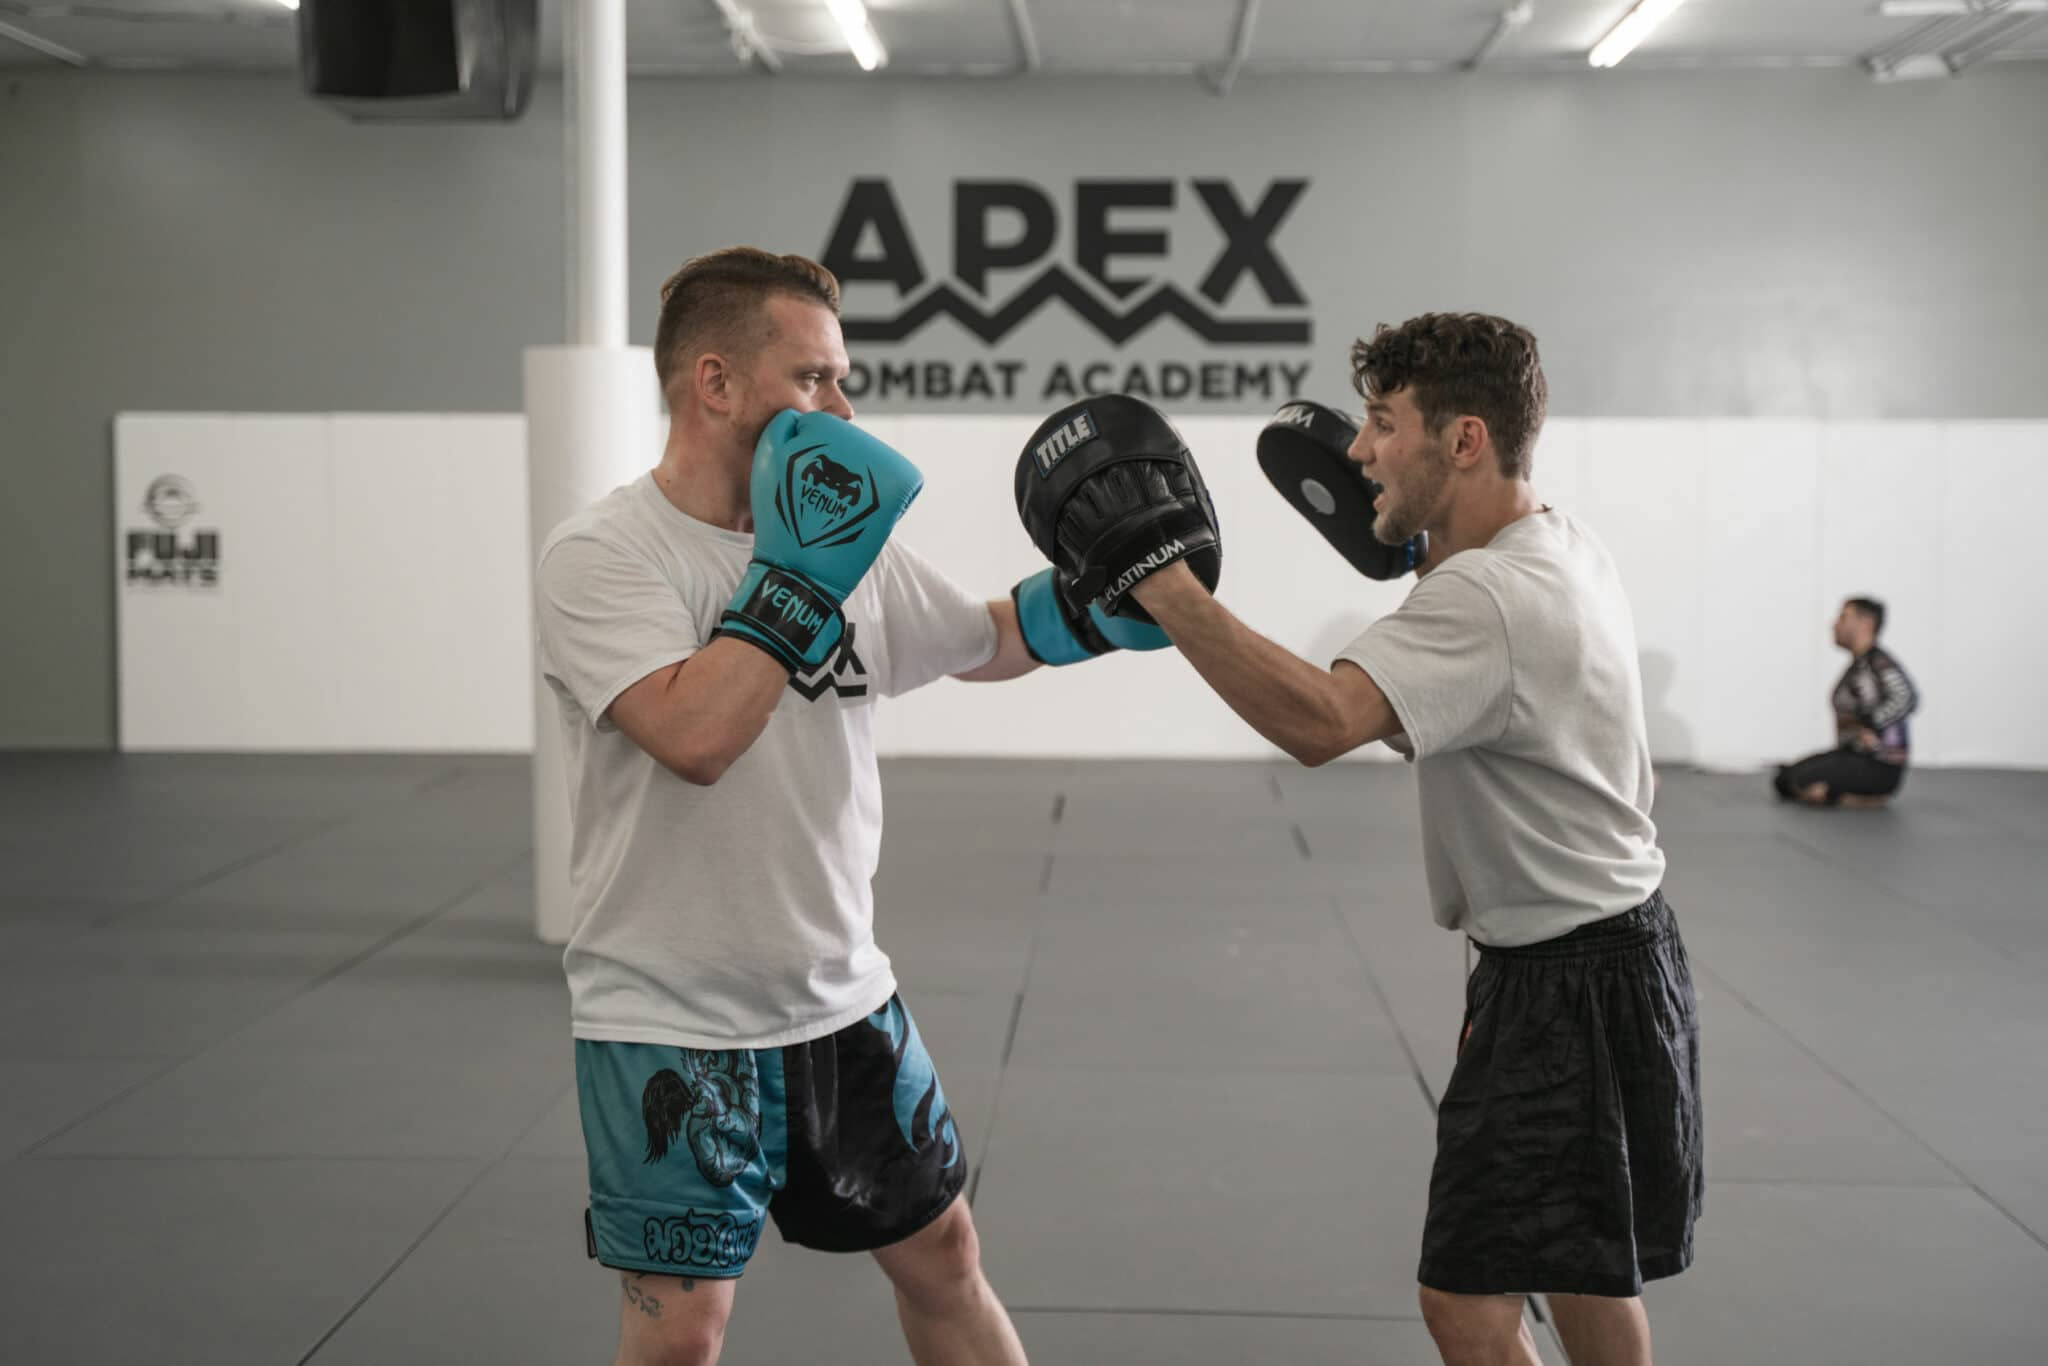 Apex Combat Academy Beginners Muay Thai Kickboxing